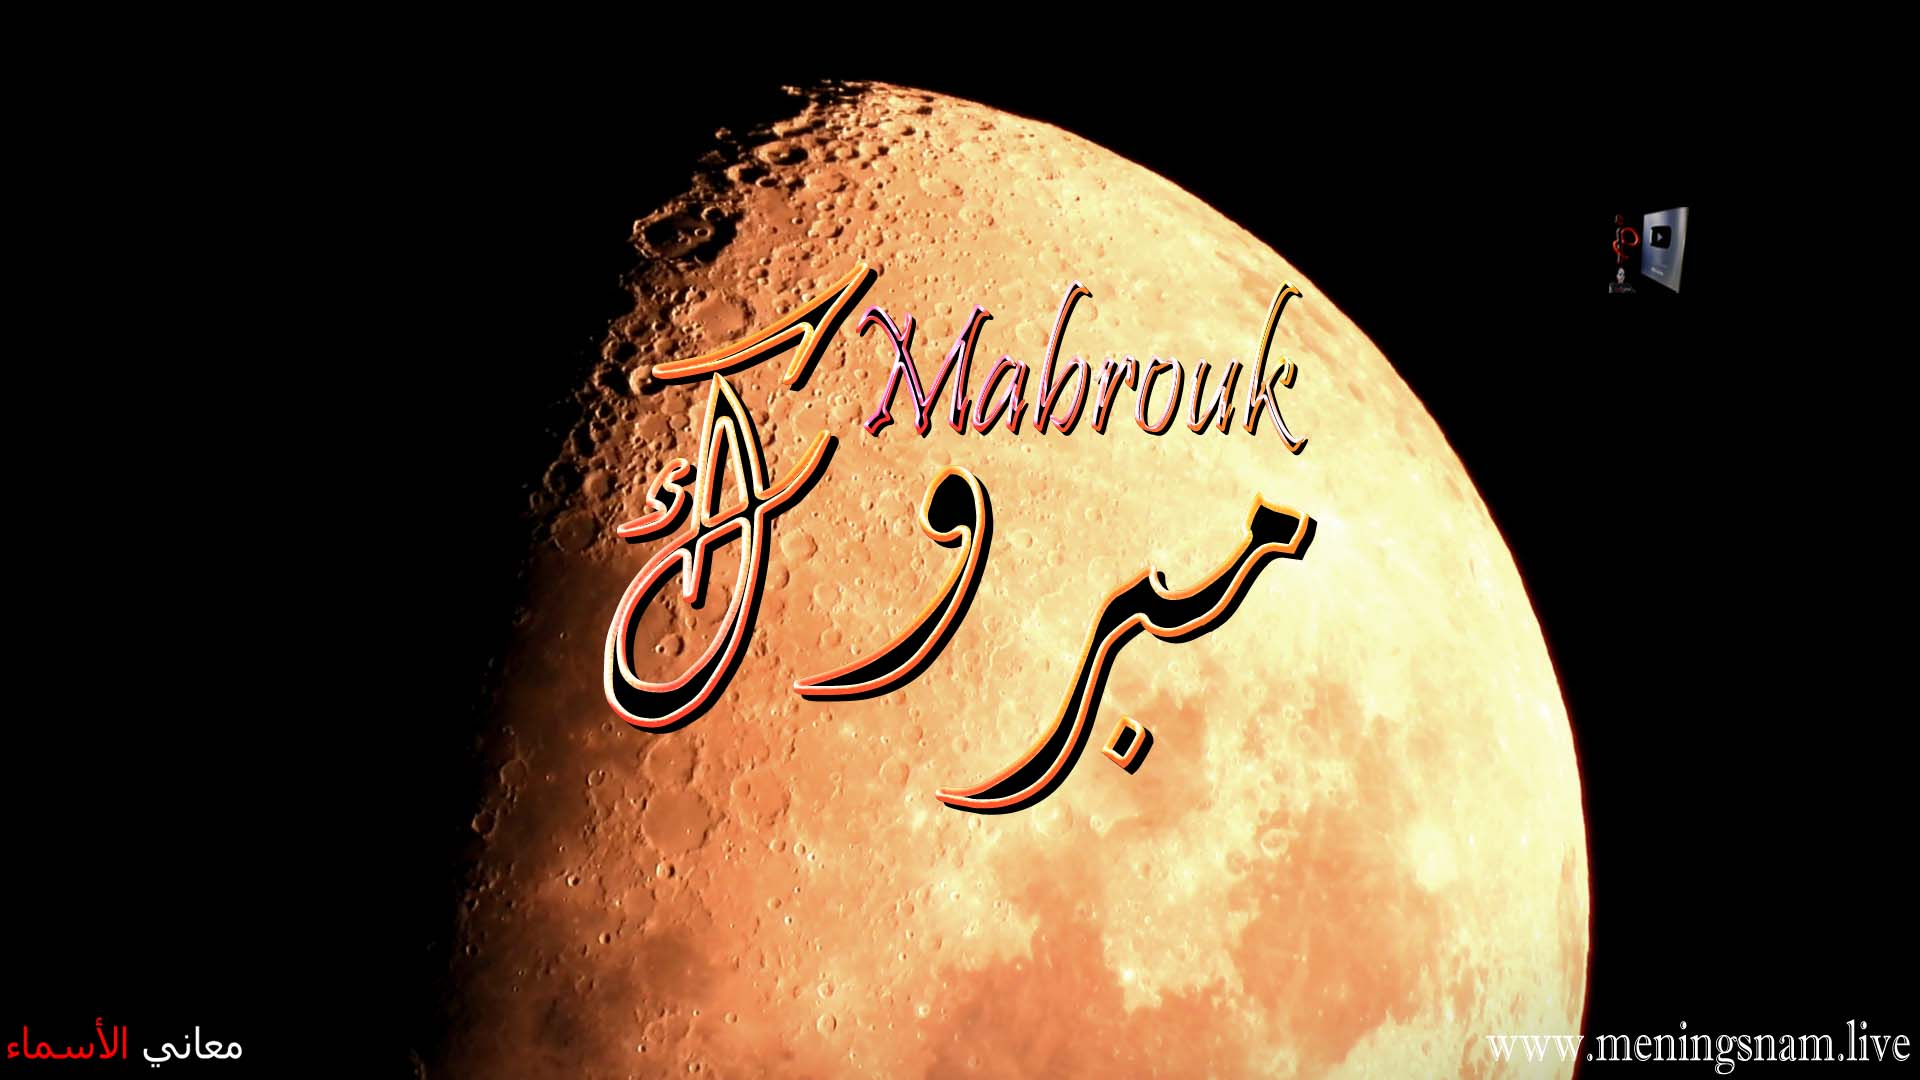 معنى اسم مبروك وصفات حامل هذا الاسم Mabrouk